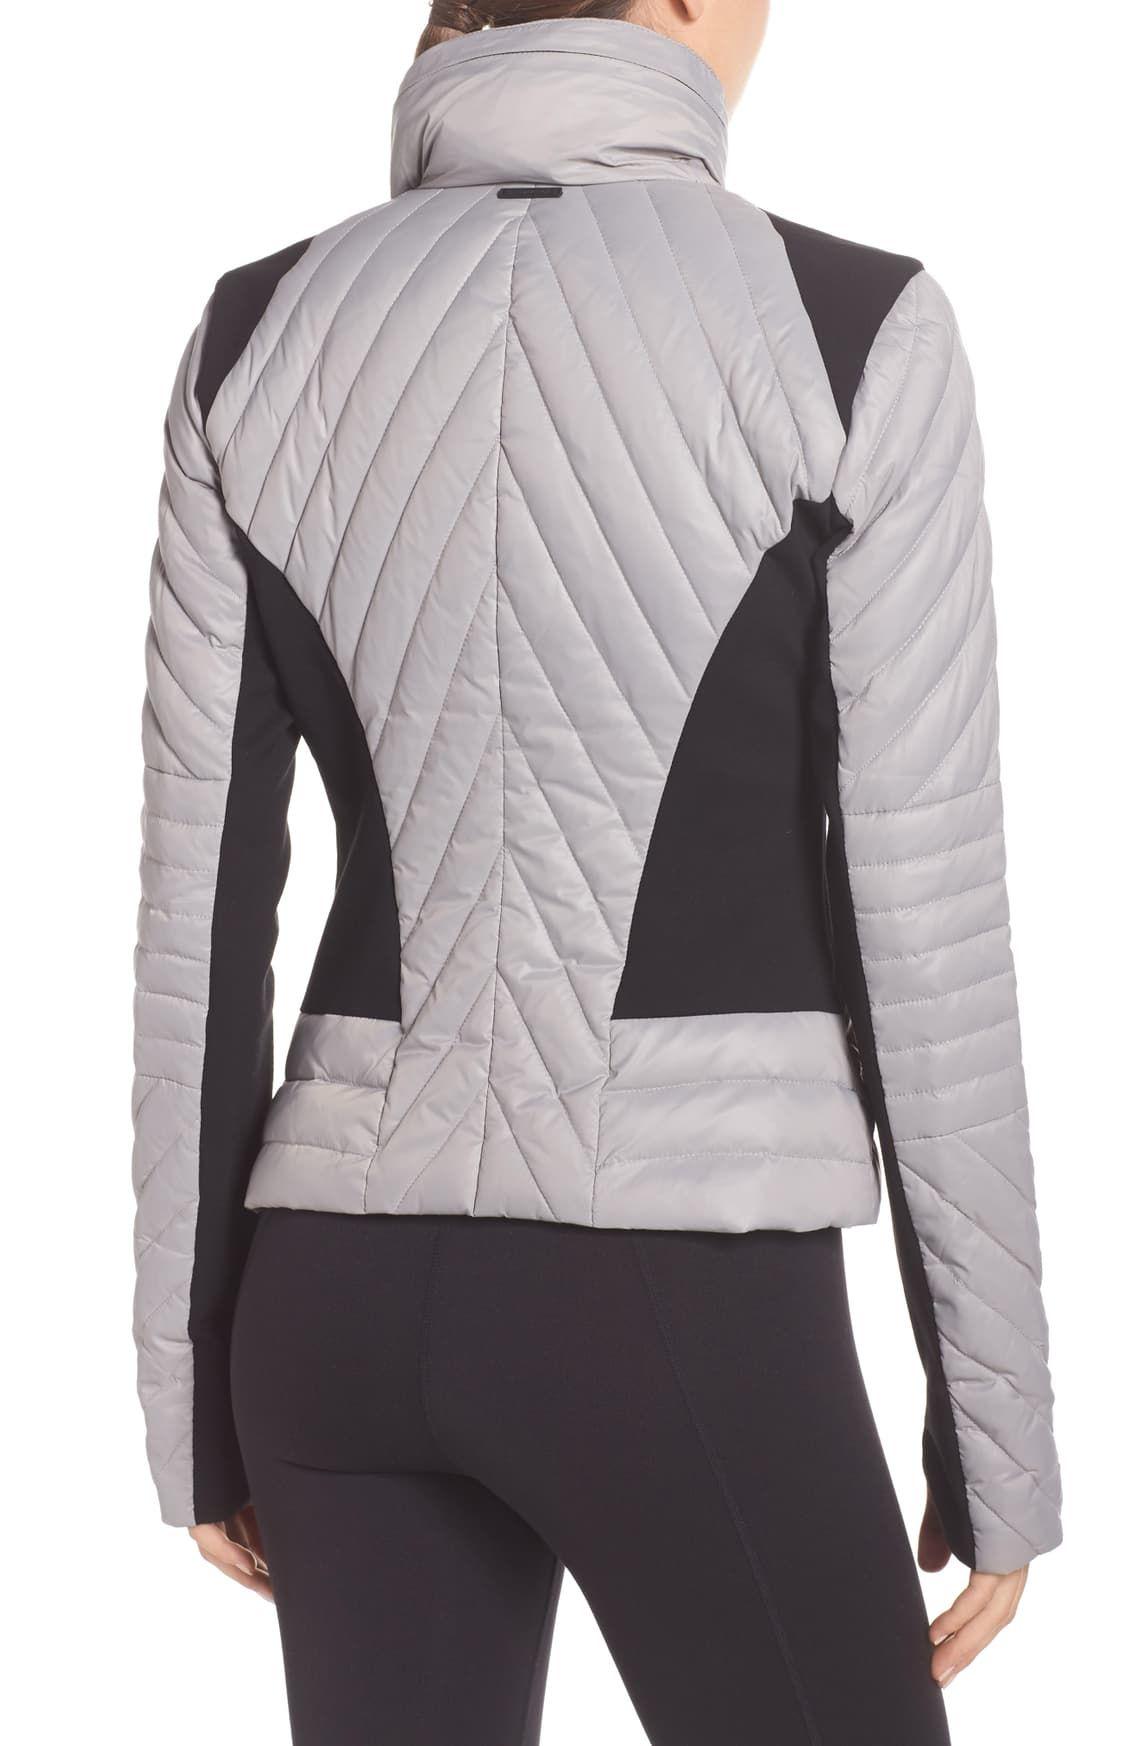 Blanc Noir Motion Panel Down Puffer Jacket Nordstrom Puffer Jackets Jackets Nordstrom [ 1746 x 1140 Pixel ]